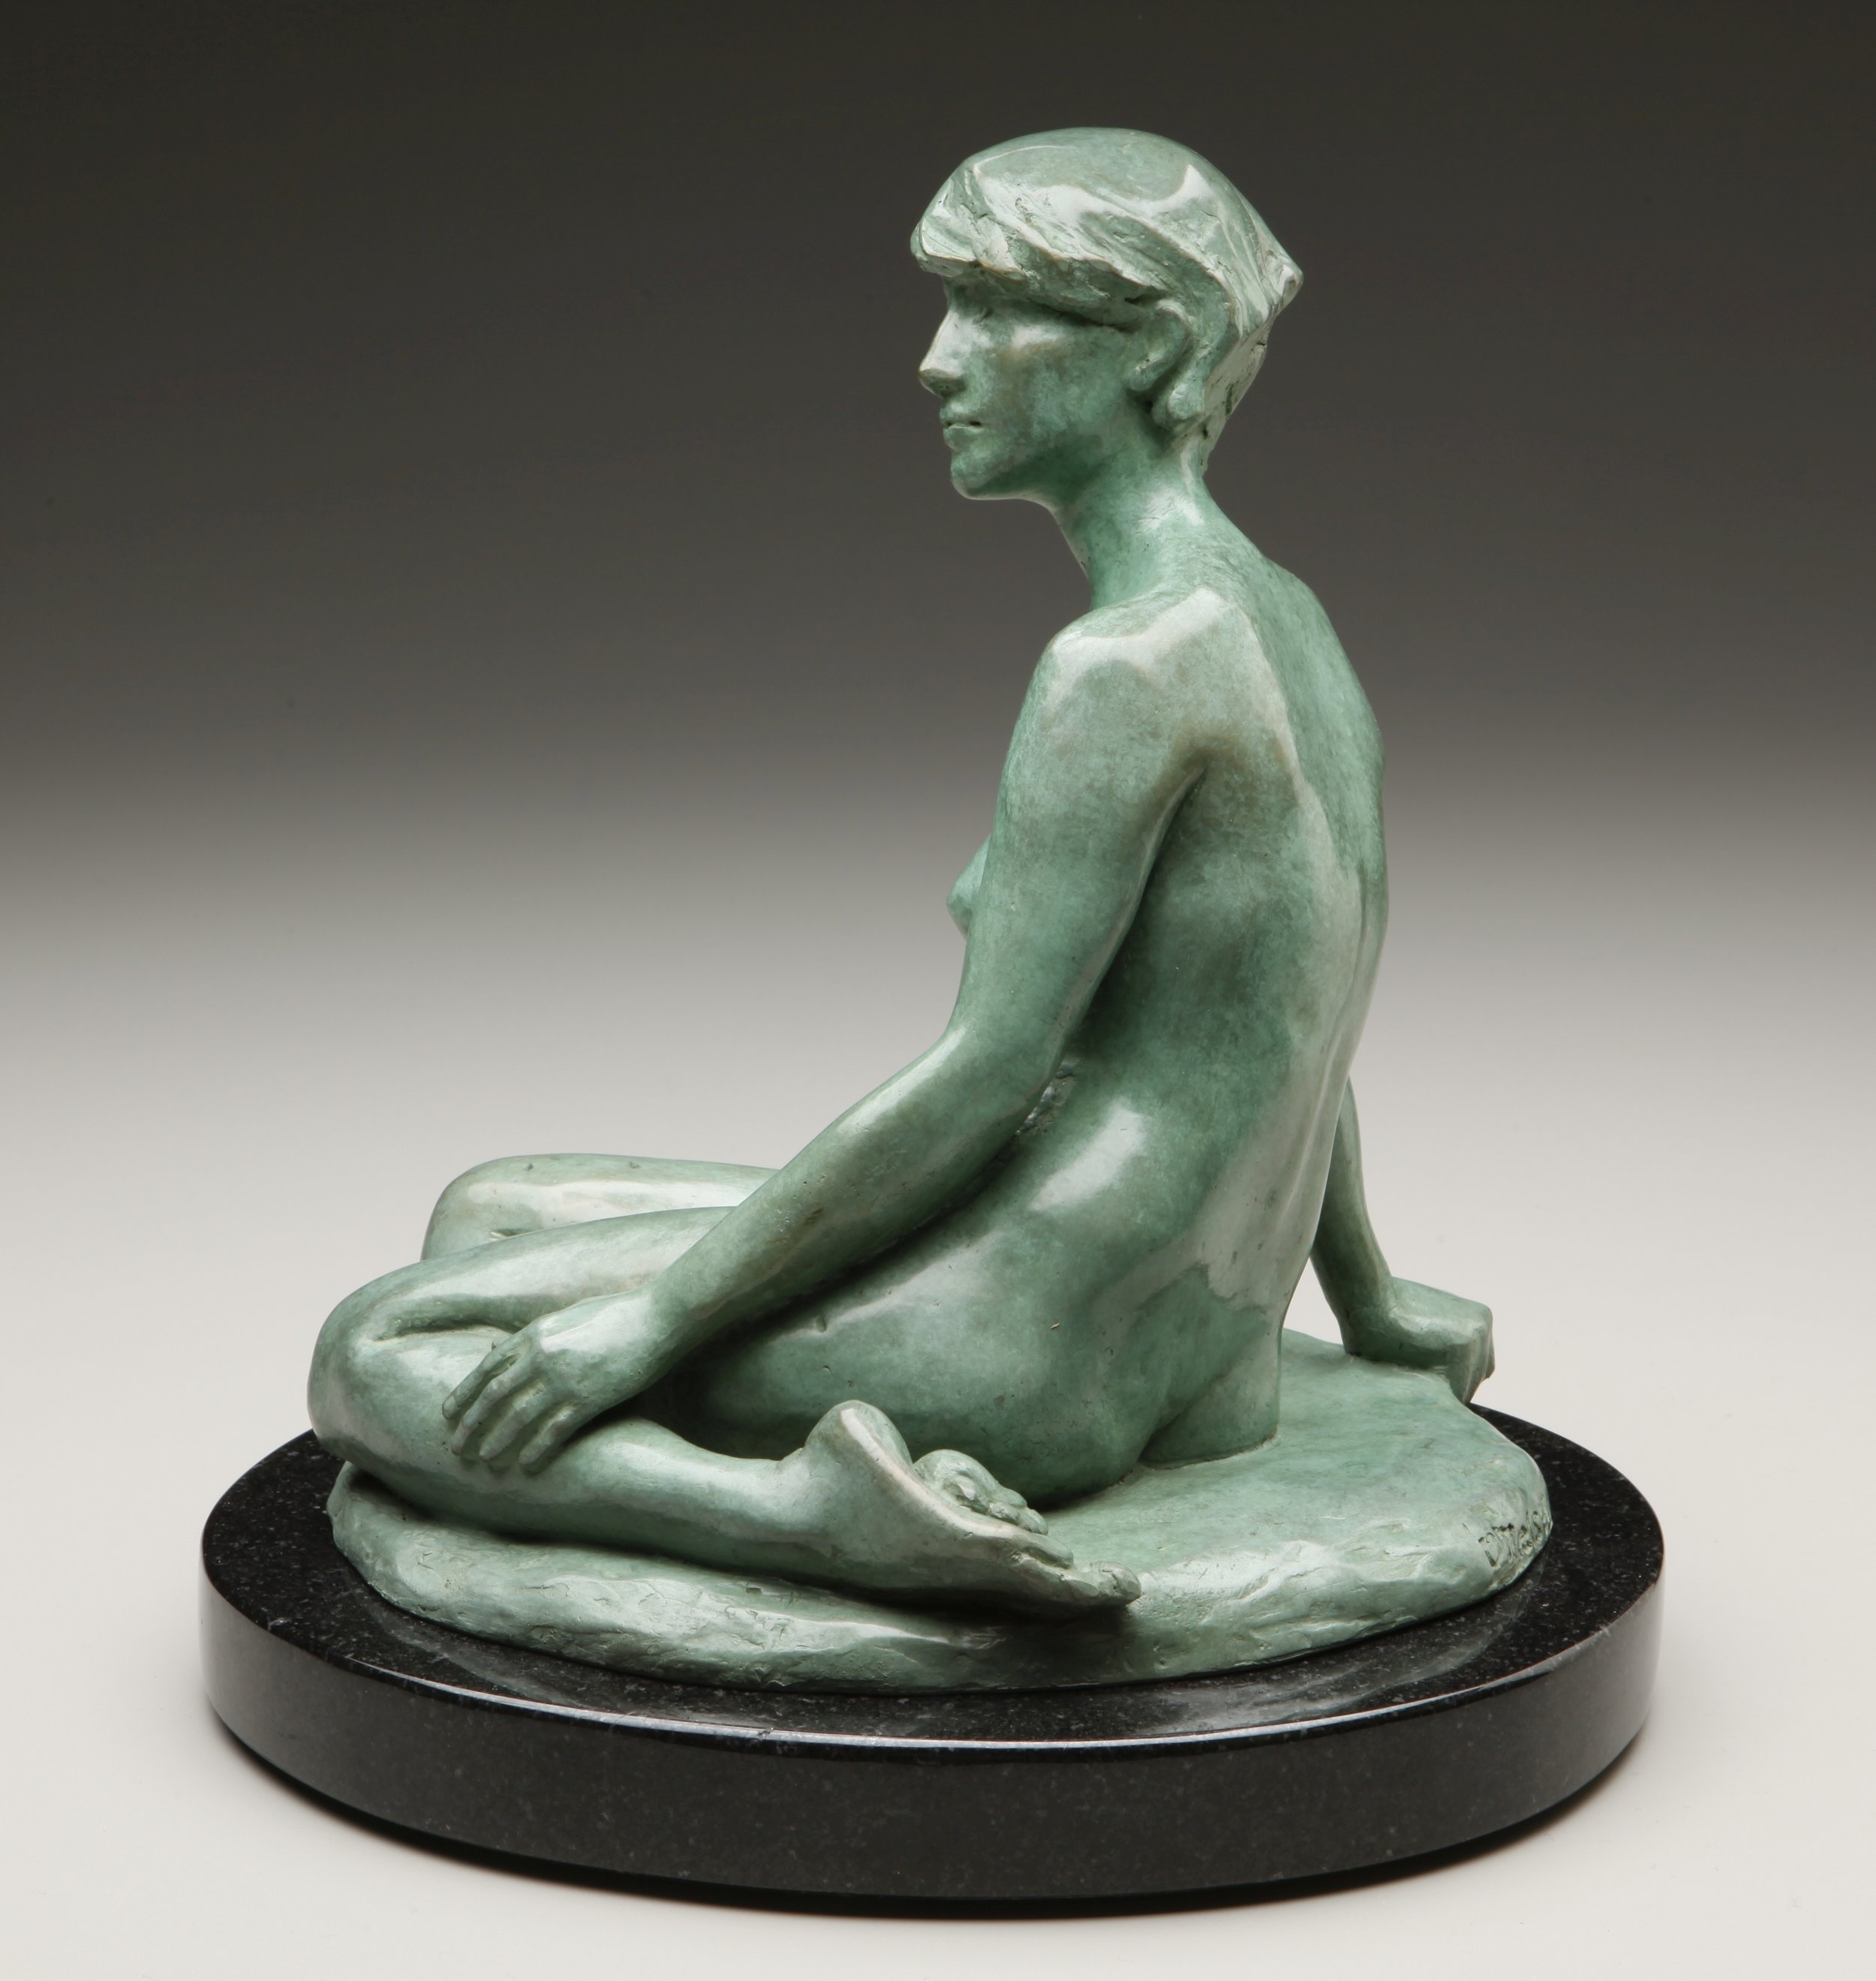 Olga Nielsen Title: Silence Size: 12 x 9 x 11 Price: $5500